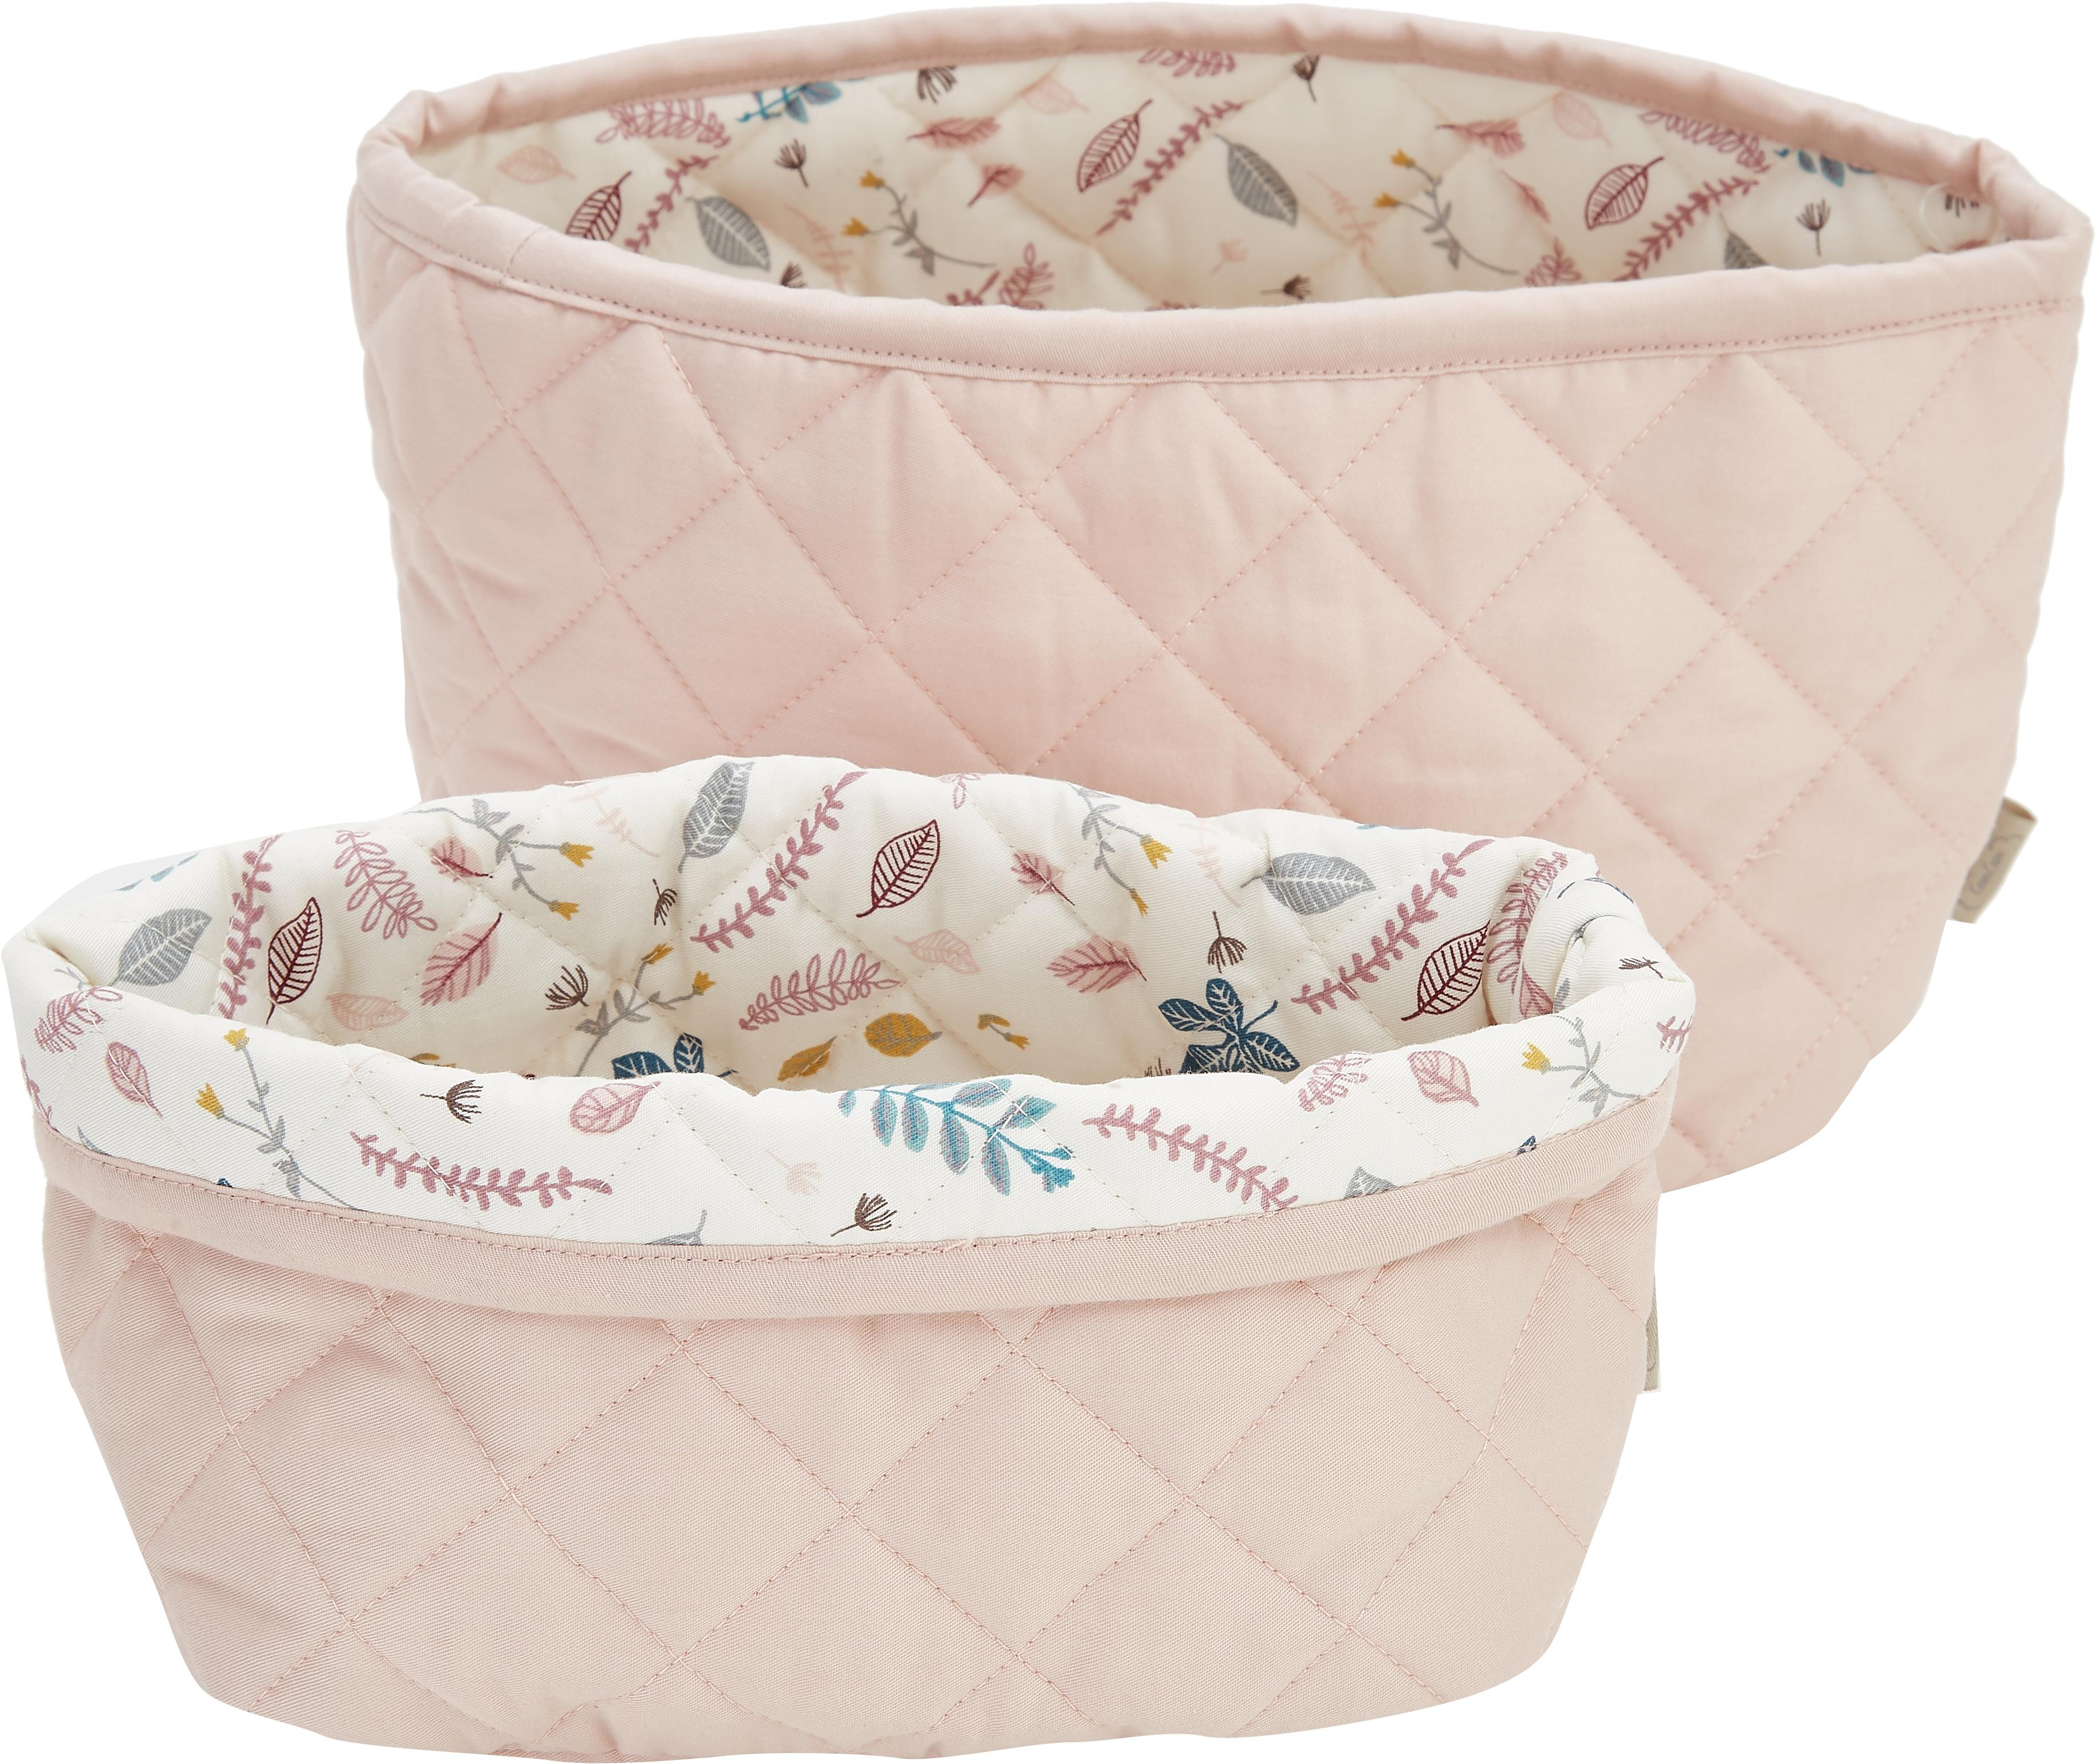 Set de cestas de algodón ecológico Pressed Leaves, 2pzas., Exterior: algodón orgánico, Crema, rosa, azul, gris, Set de diferentes tamaños